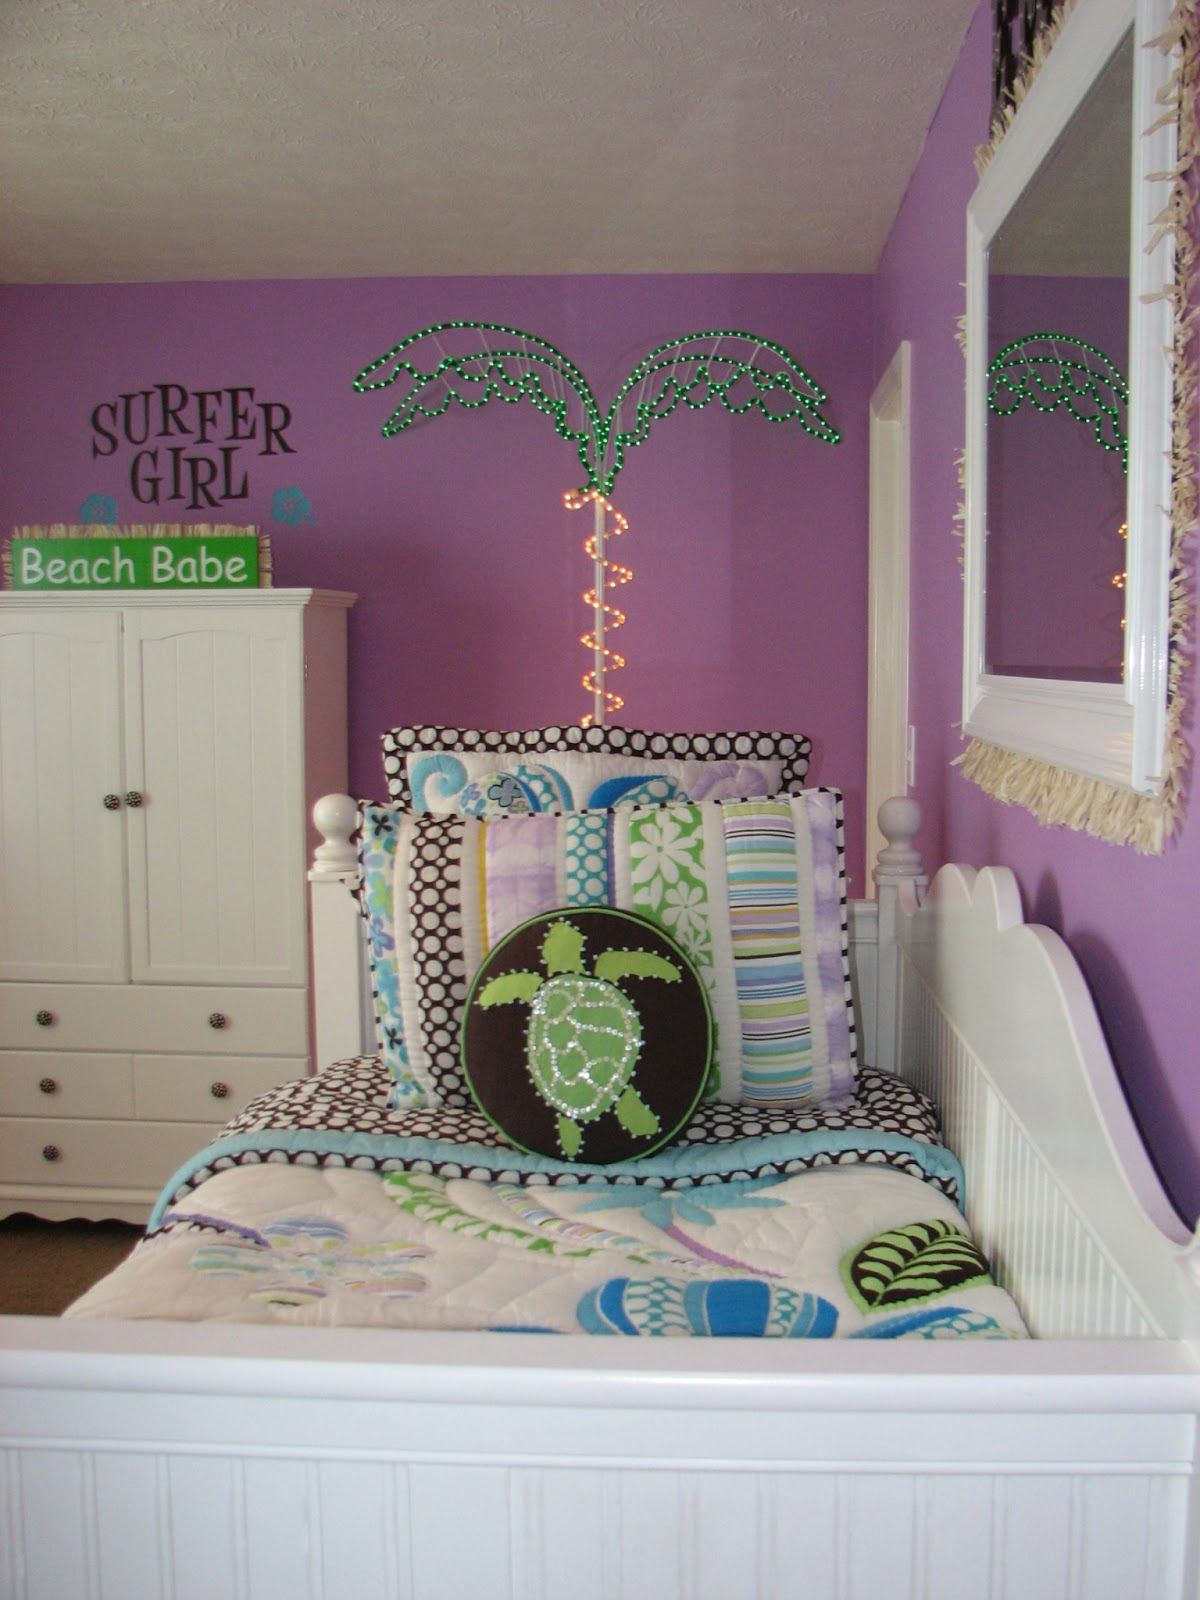 Kittles Bedroom Furniture Gotta Love A Little Bling Home Tour Sofa And Grey Trellis Rug